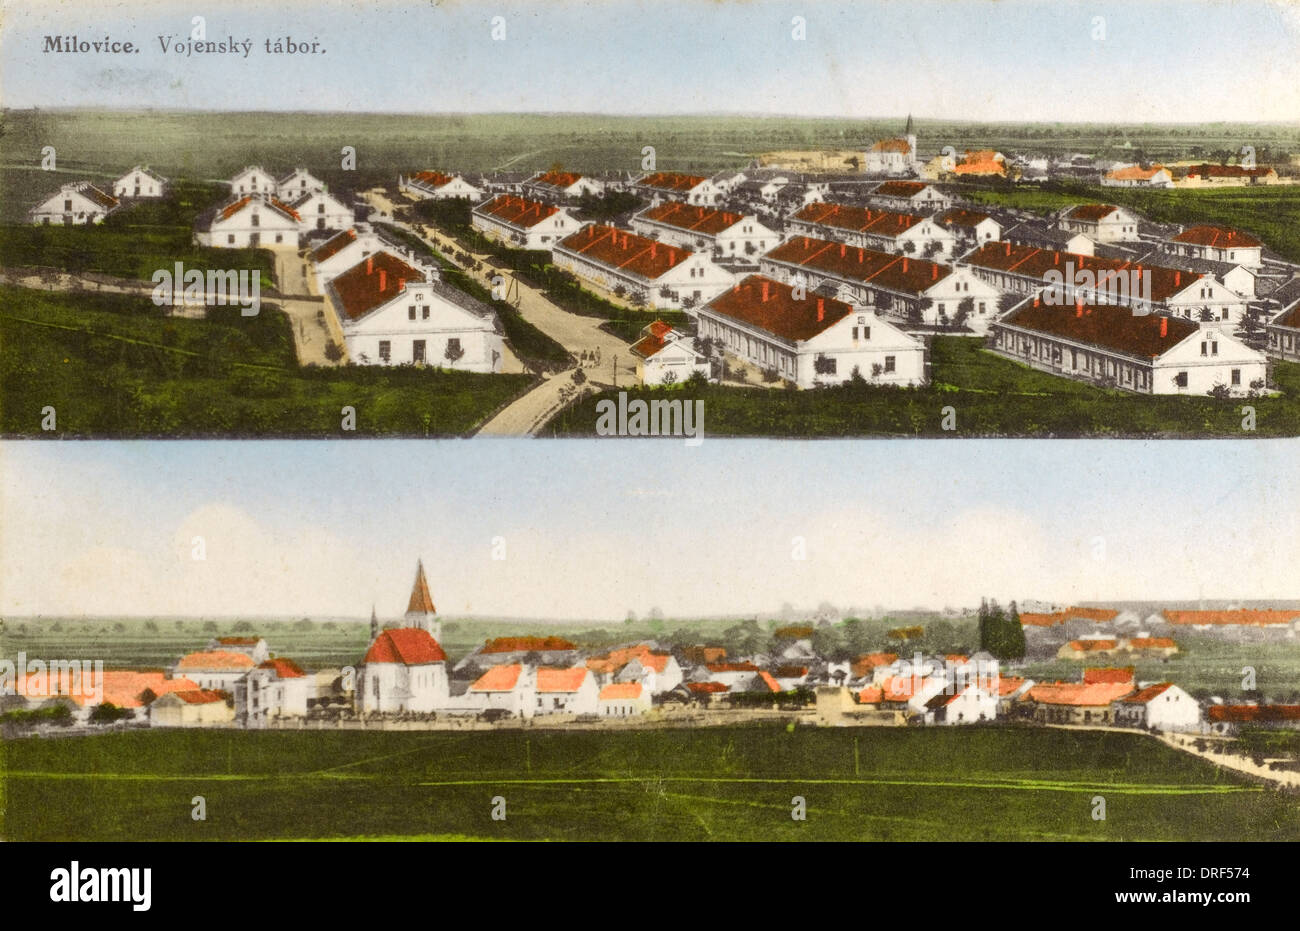 Milovice - Austro-Hungarian Military Camp/Barracks - Stock Image